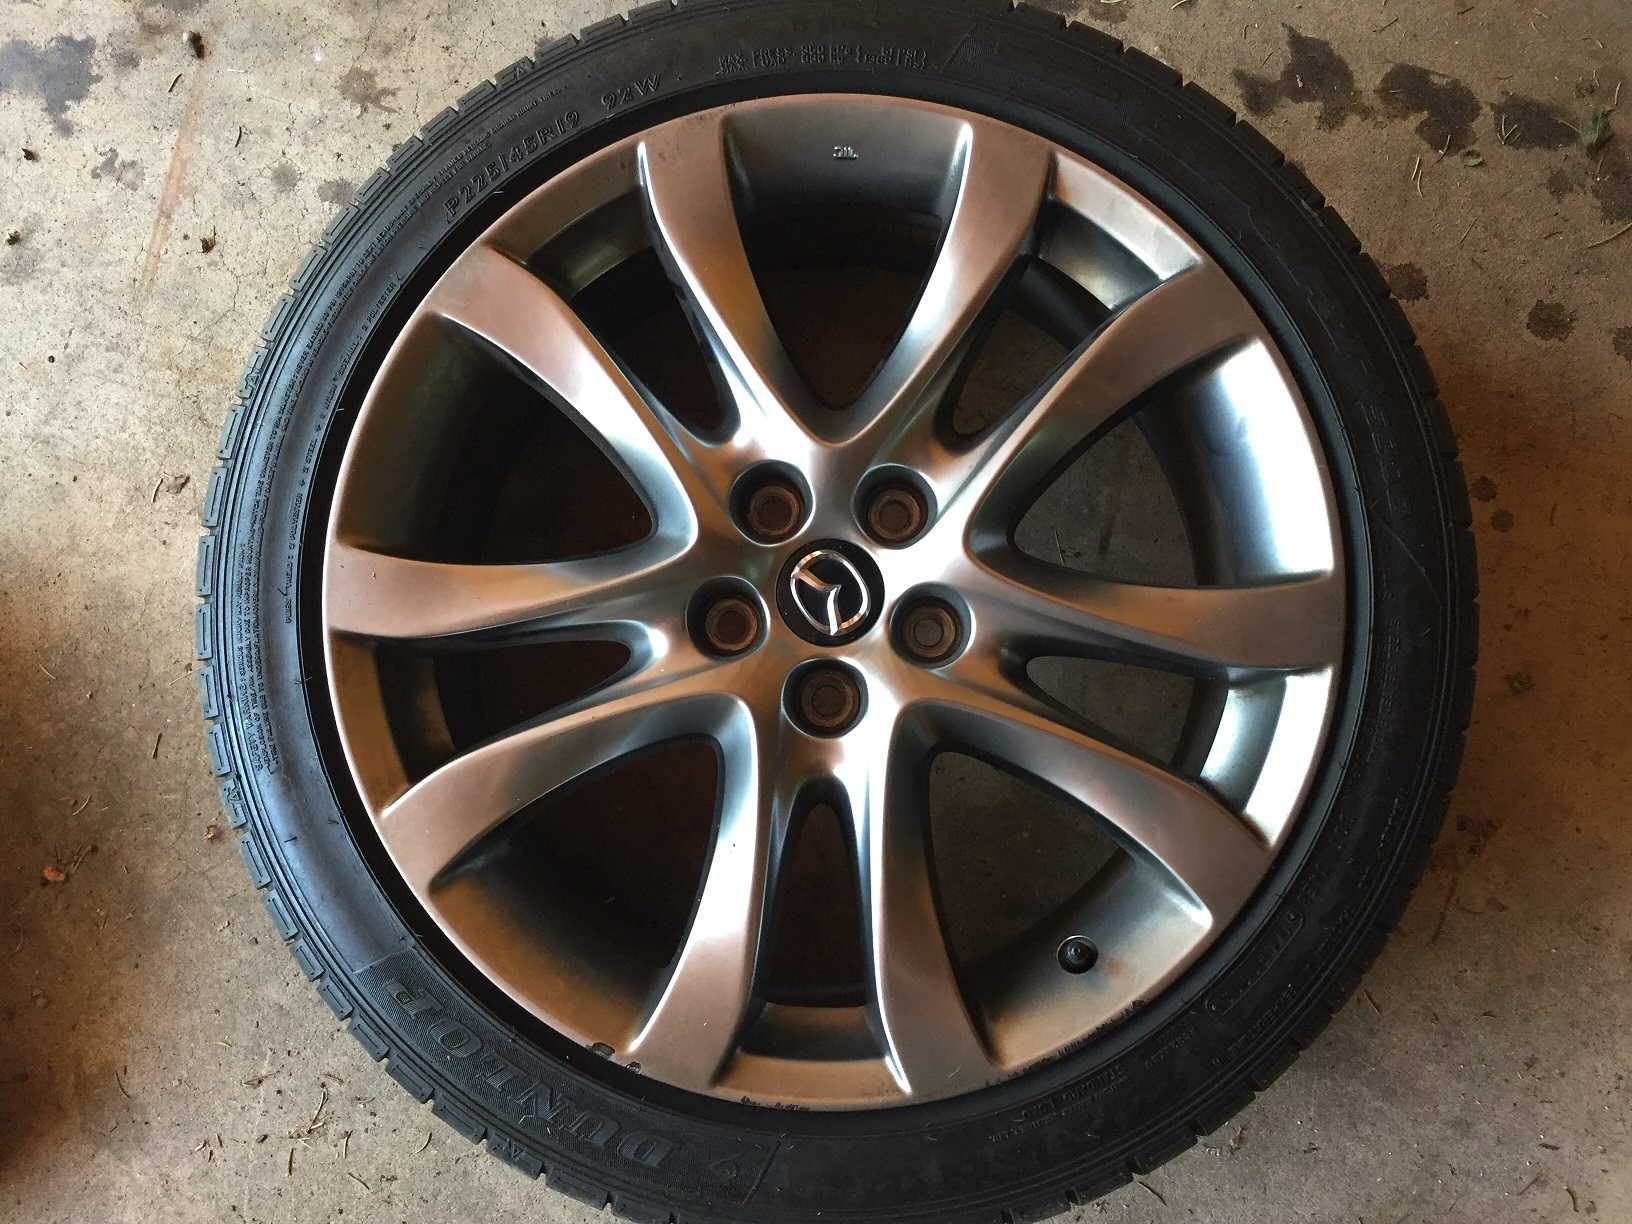 2014 mazda 6 tire size